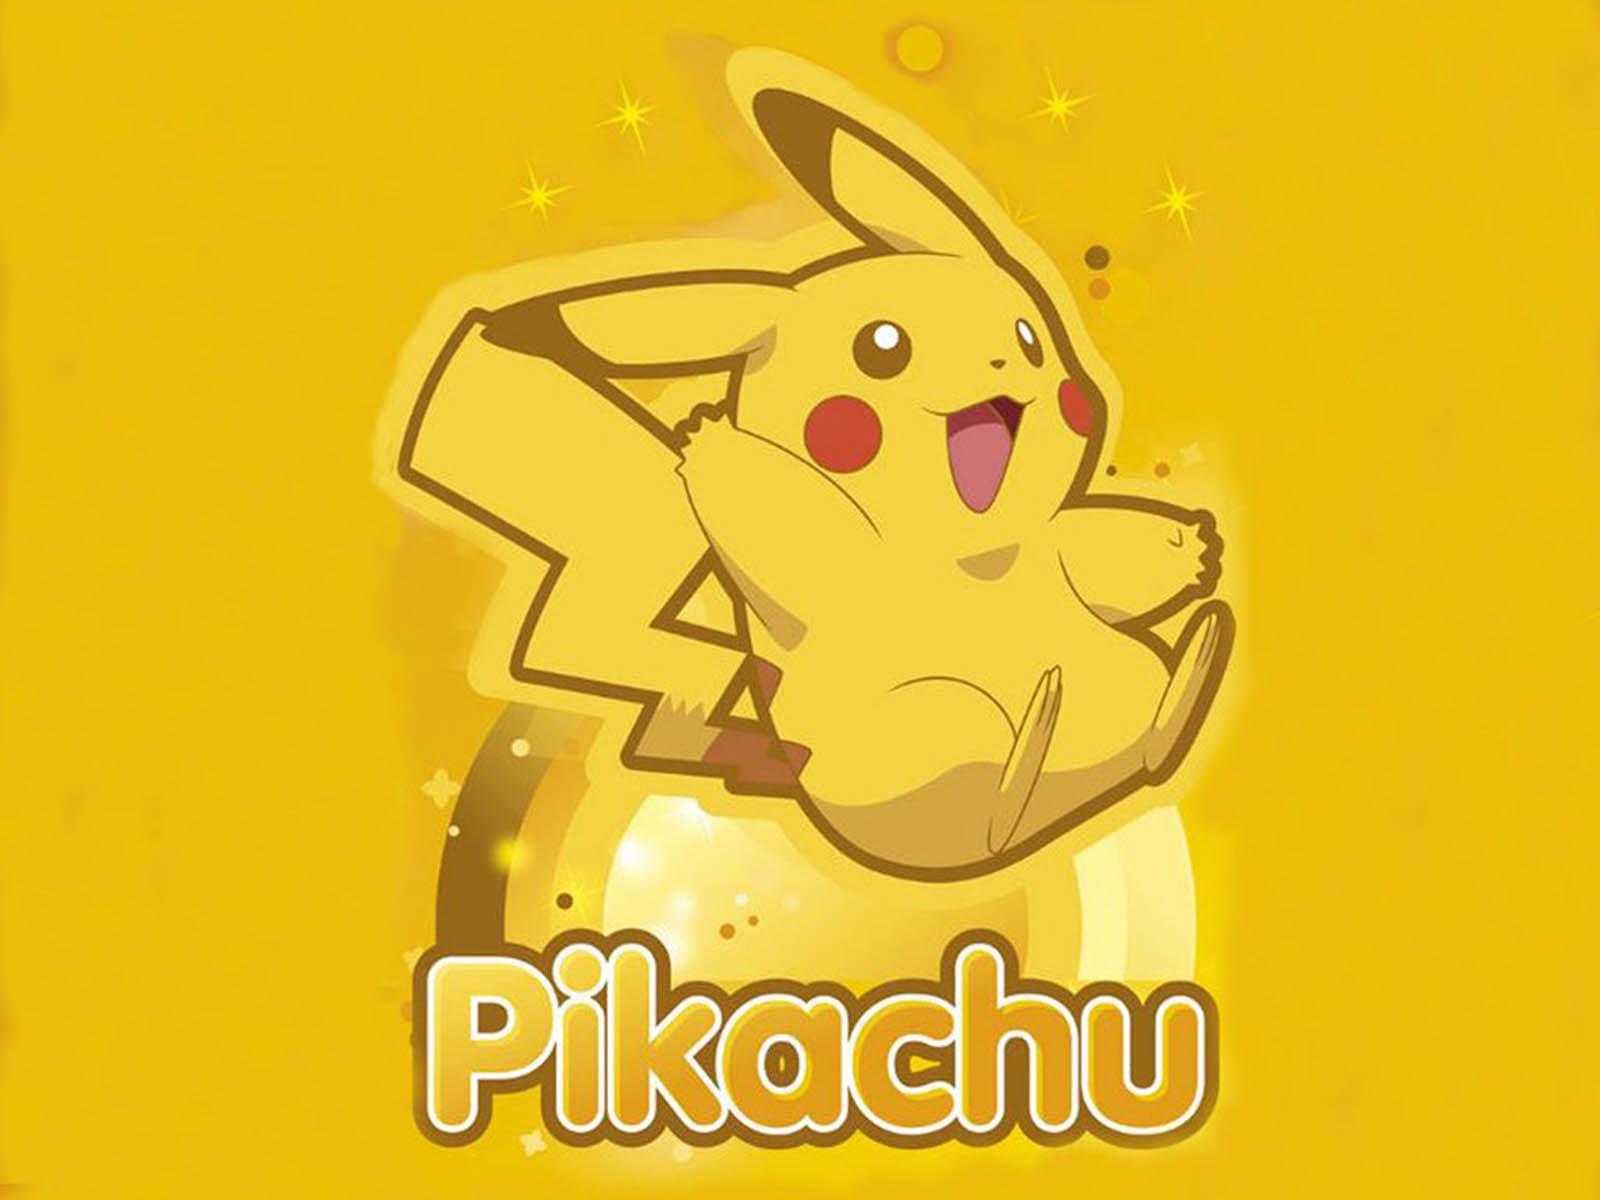 Pikachu wallpapers high quality download free - Image pikachu ...